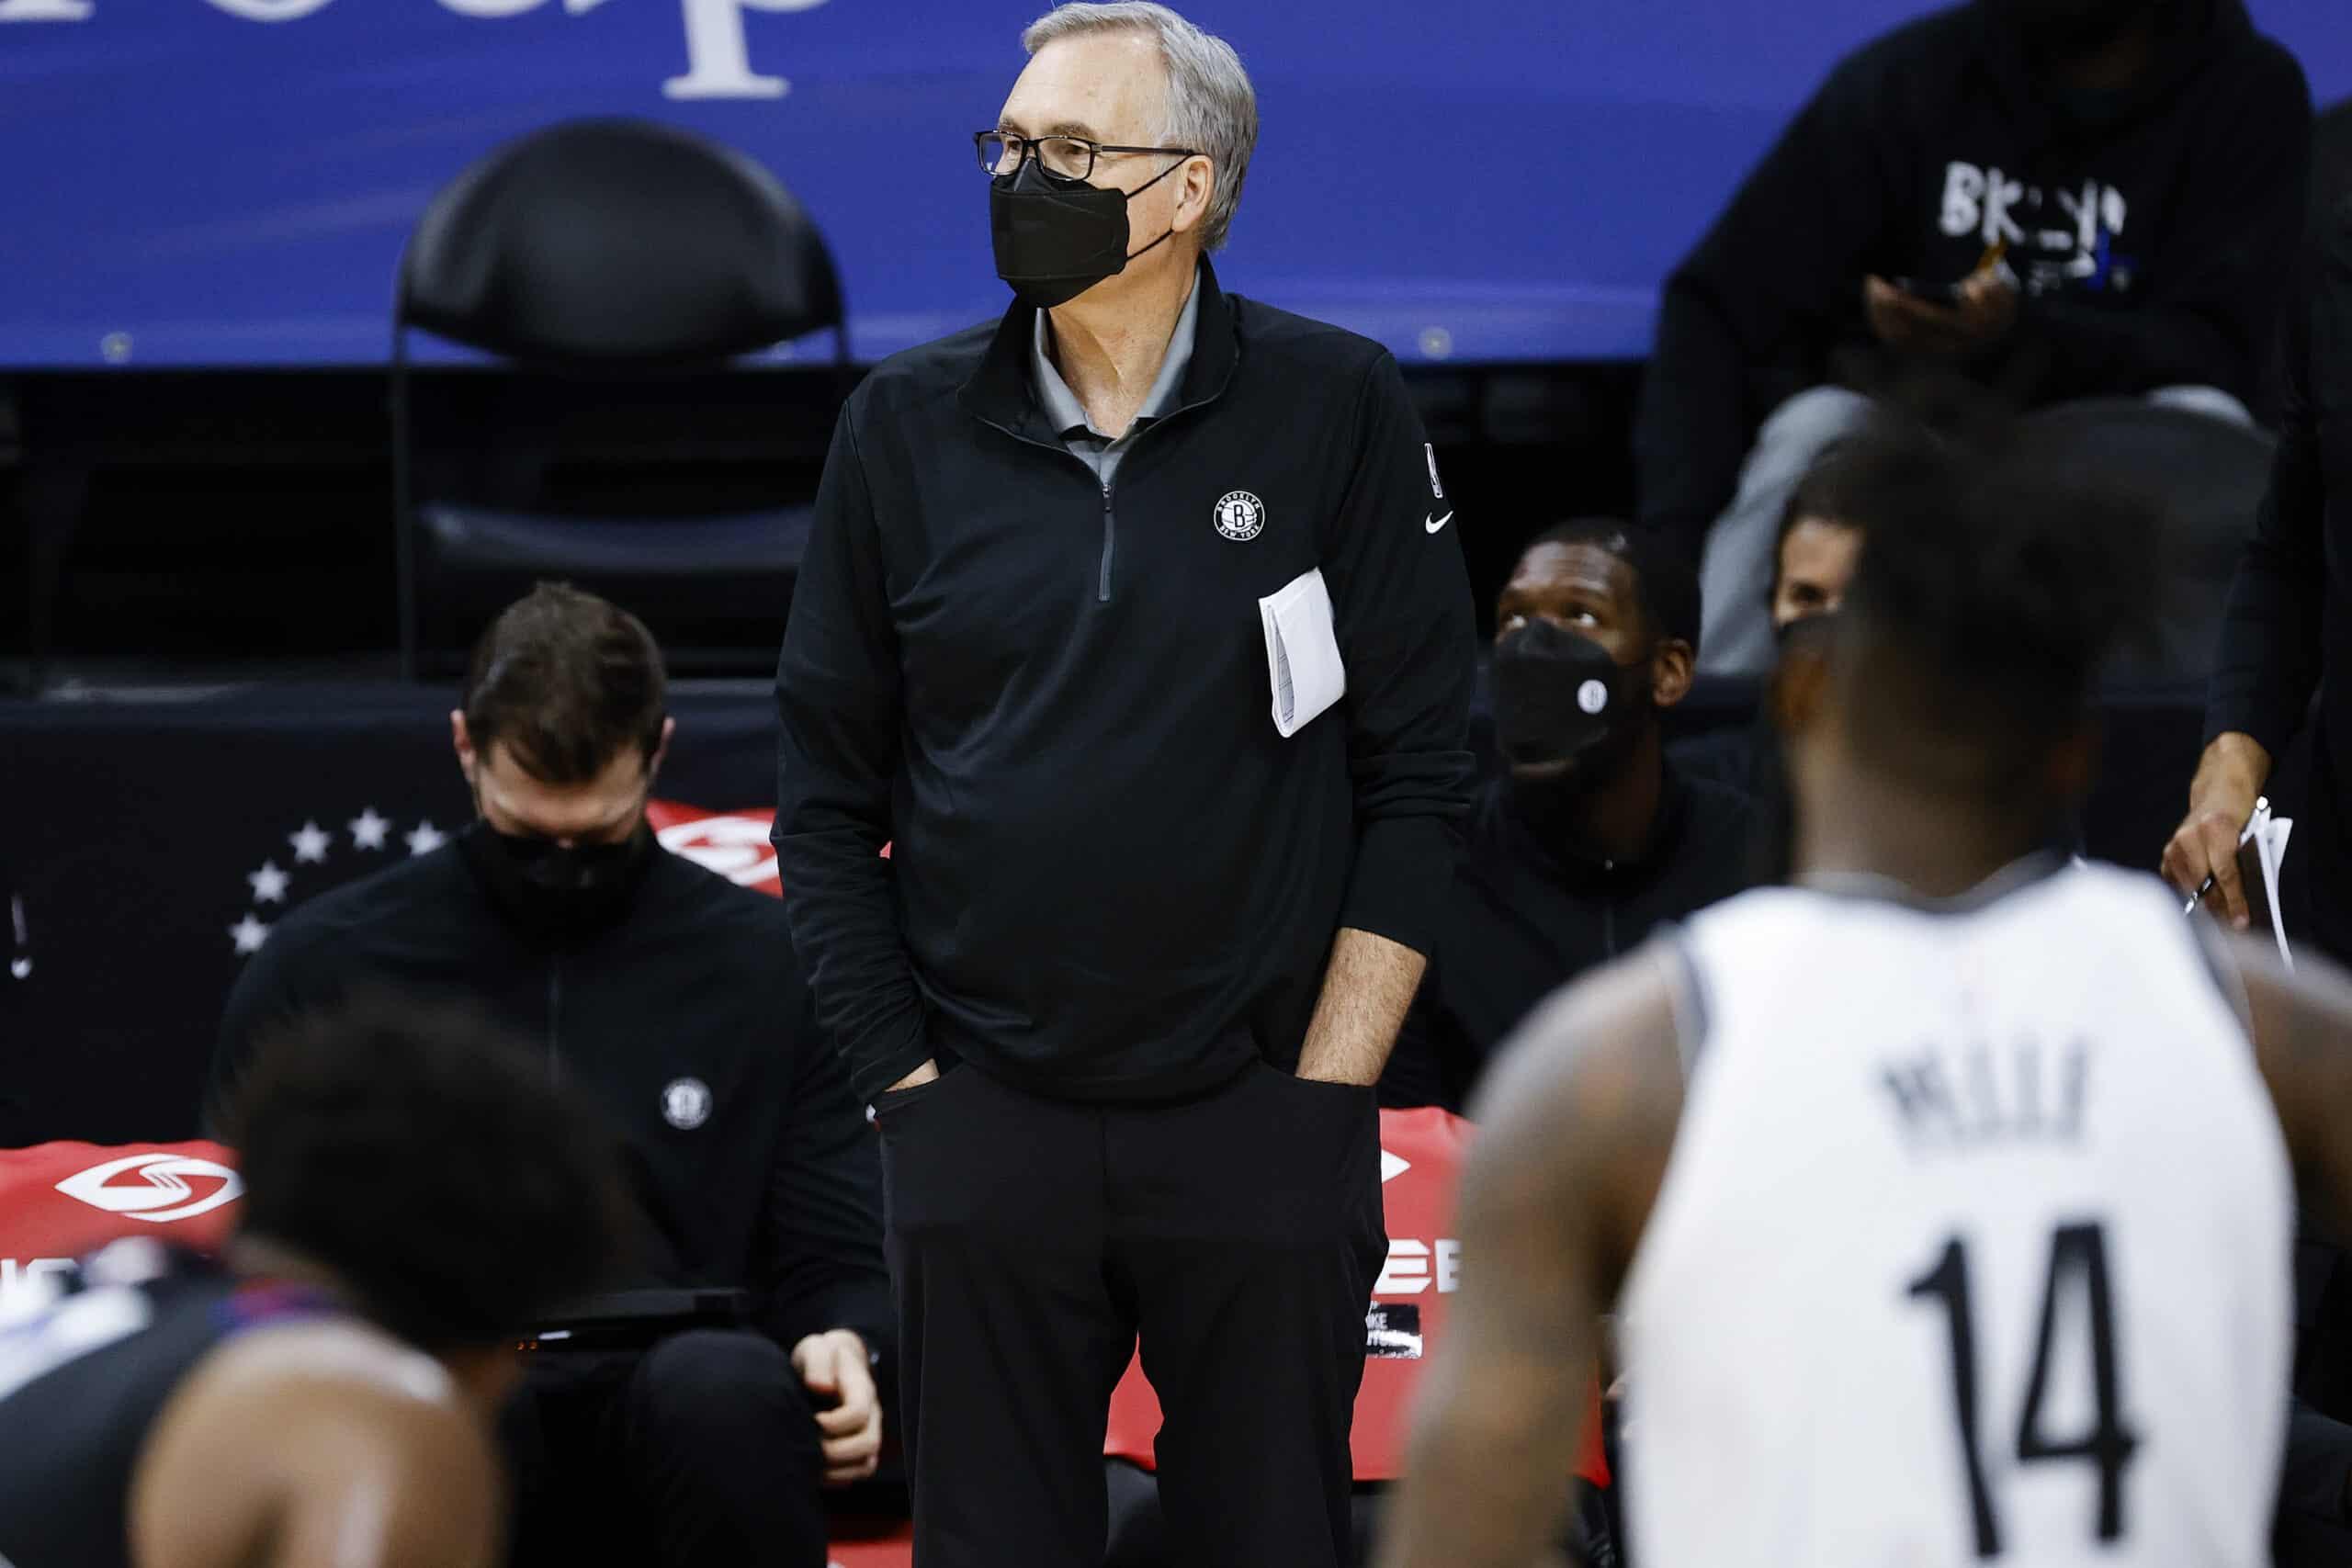 NBA Assistant coach Mike D'Antoni (C) looks on against the Philadelphia 76ers at Wells Fargo Center on February 06, 2021 in Philadelphia, Pennsylvania.